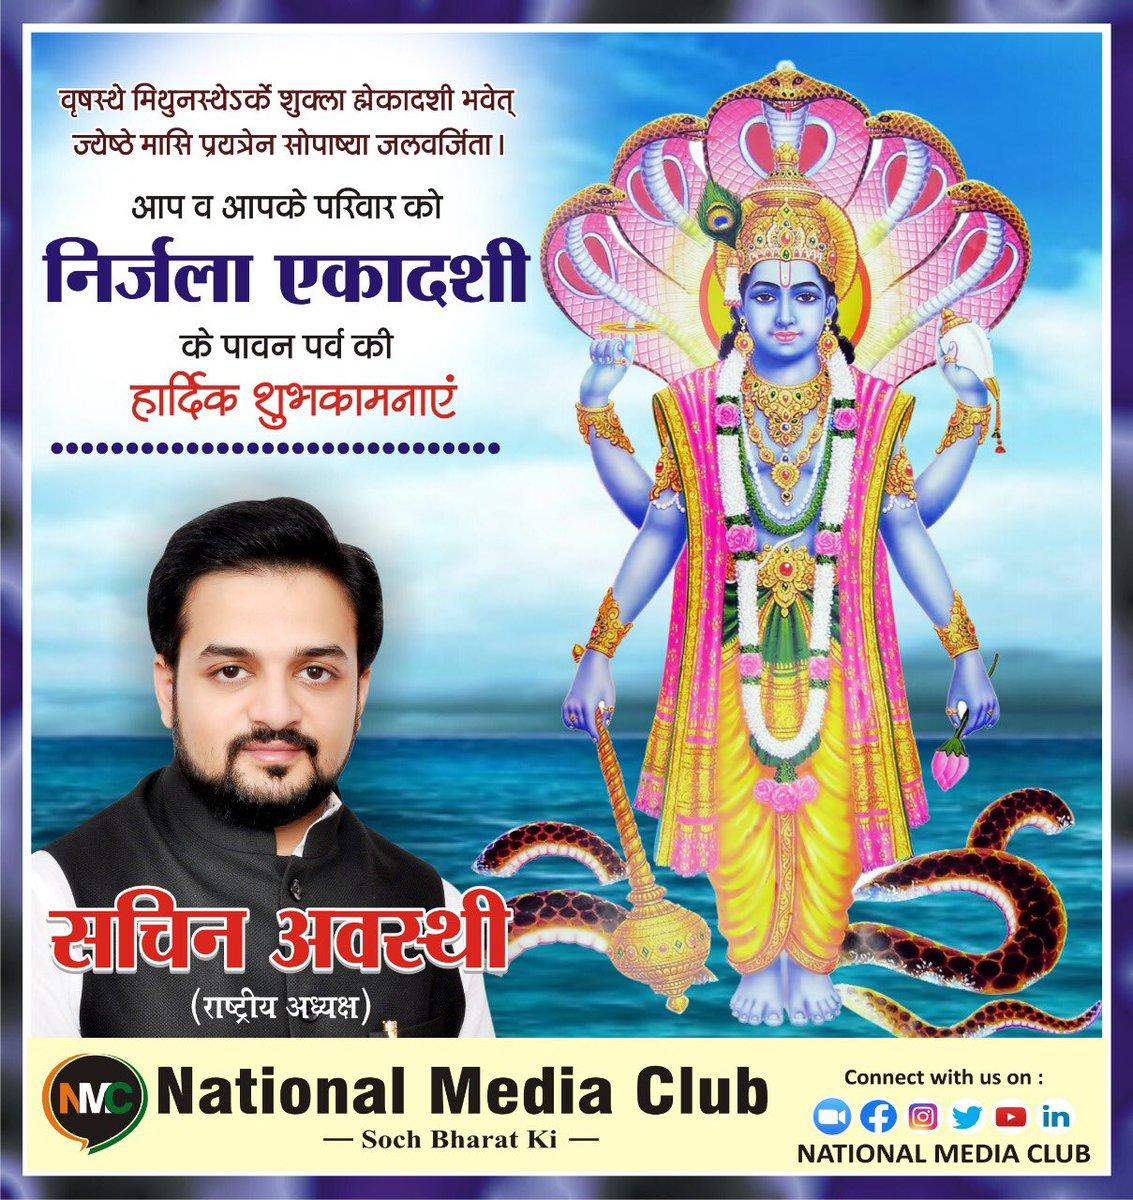 #NirjalaEkadashi2020 #NirjalaEkadashi #NationalMediaClub #SachinAwasthi #Sachinnmc https://t.co/eBzgrkvCa0